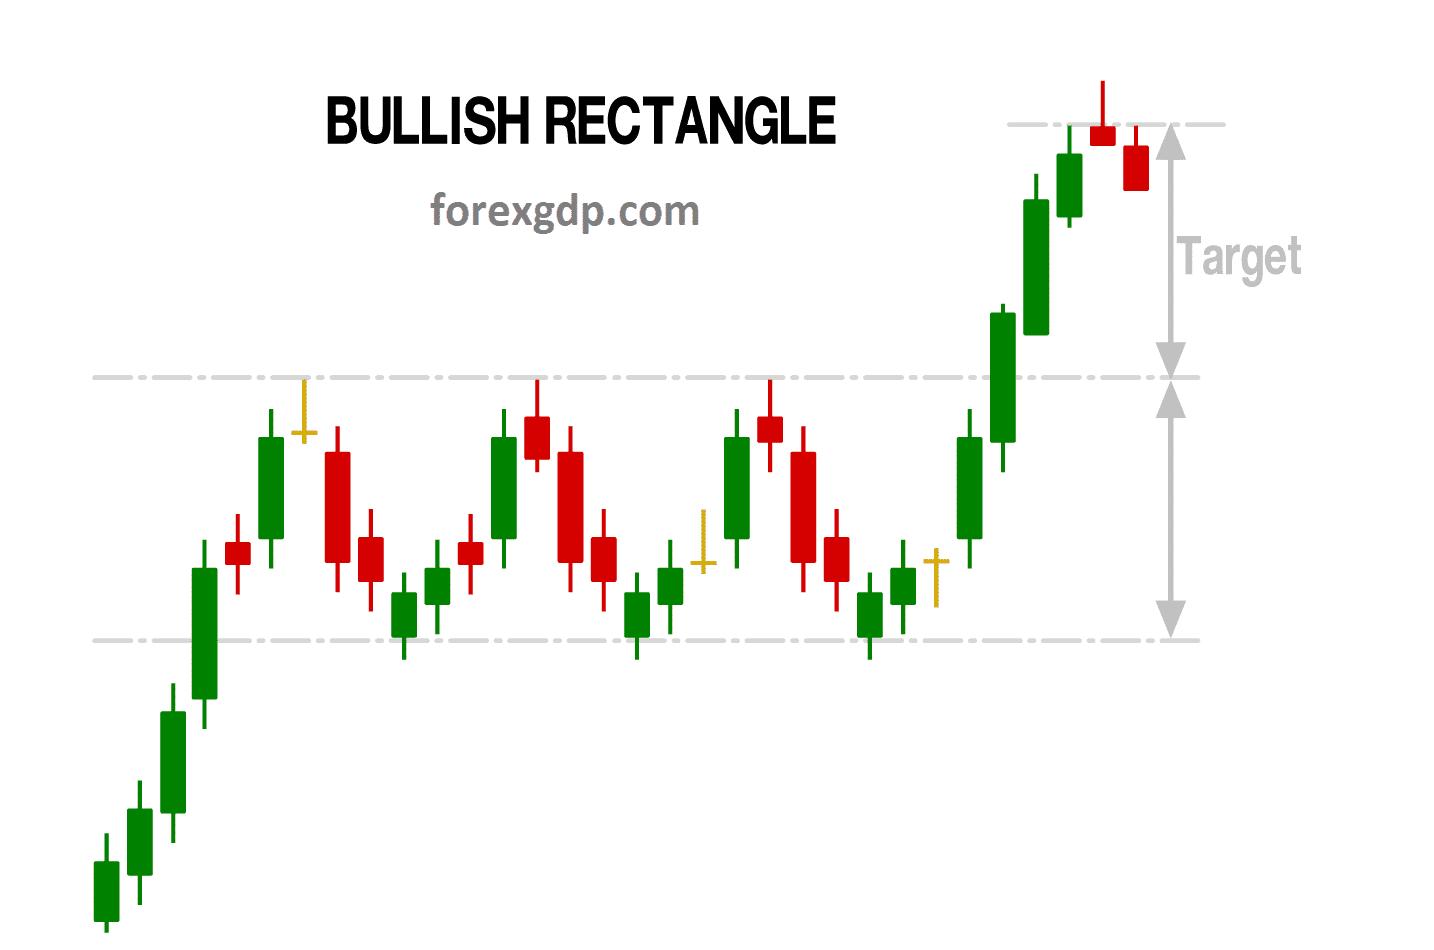 Bullish Rectangle take profit target